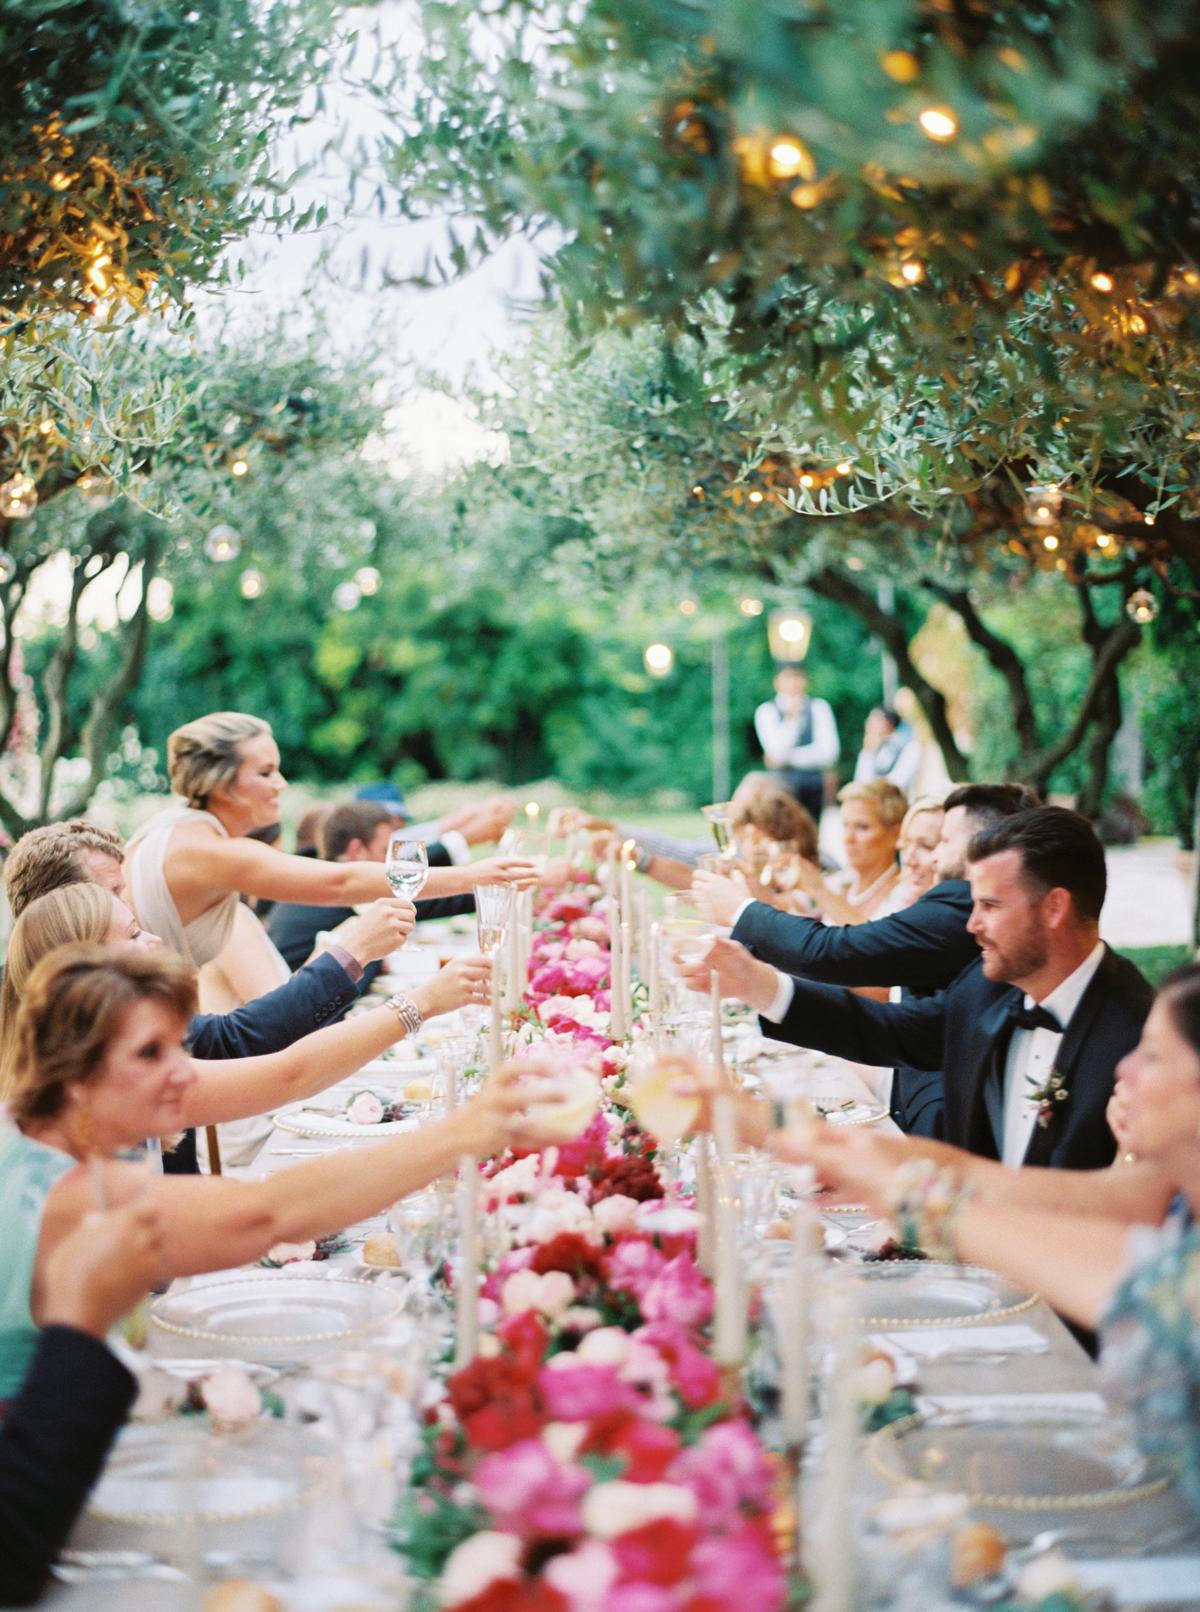 allie and joe italy wedding guests cheersing